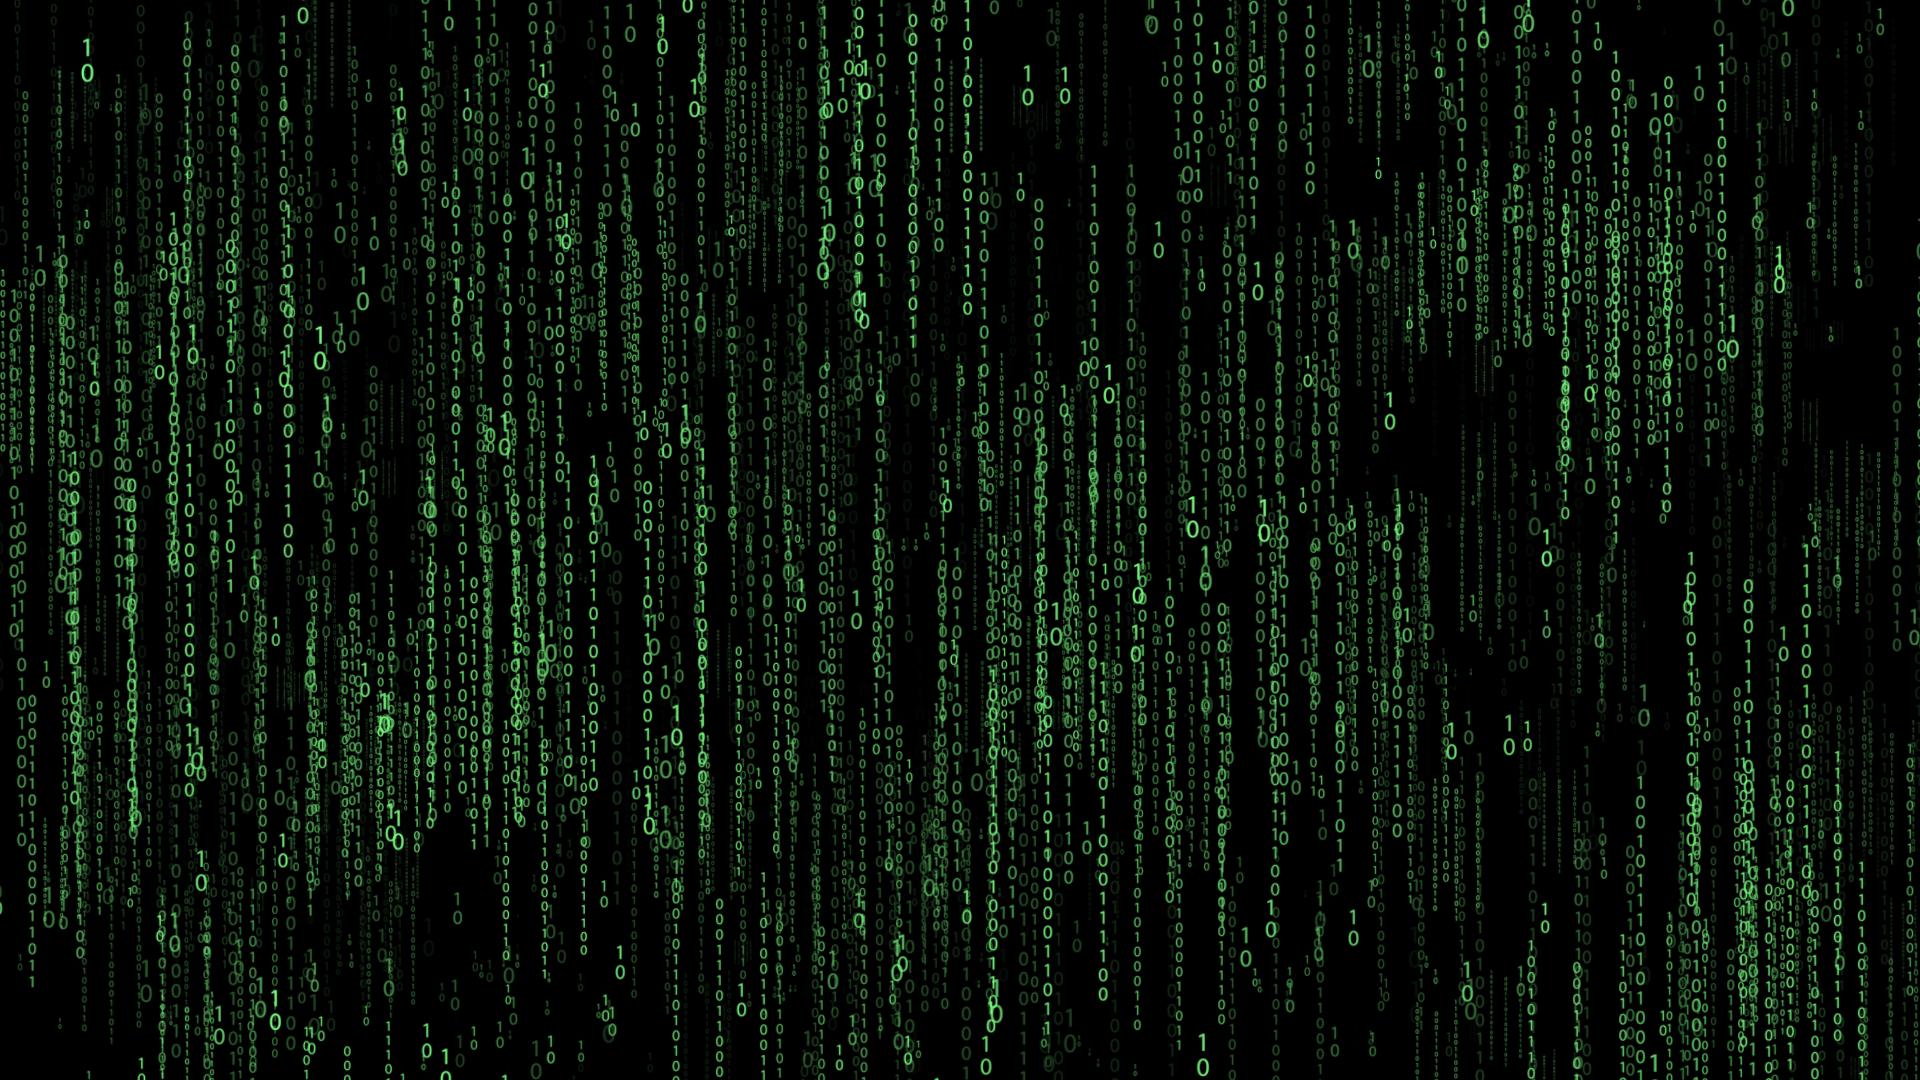 Matrix Binary Code wallpaper By Treshku by TreshkuDrago 1920x1080